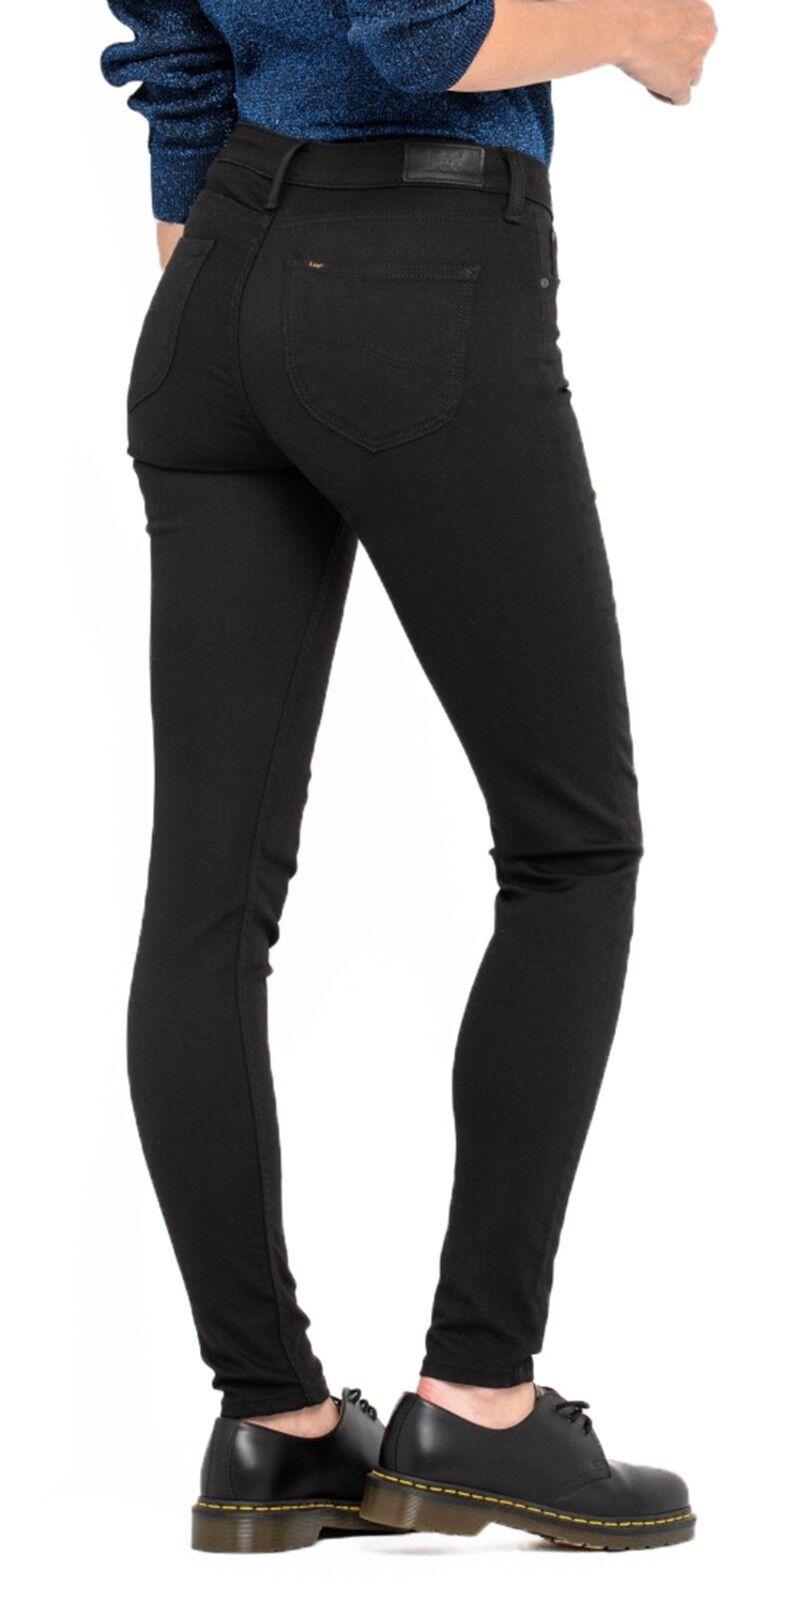 Lee Scarlett Donna Jeans Stretch DONNA skinny leg leg leg DARK Nero Risciacquo Jeans 4841ef